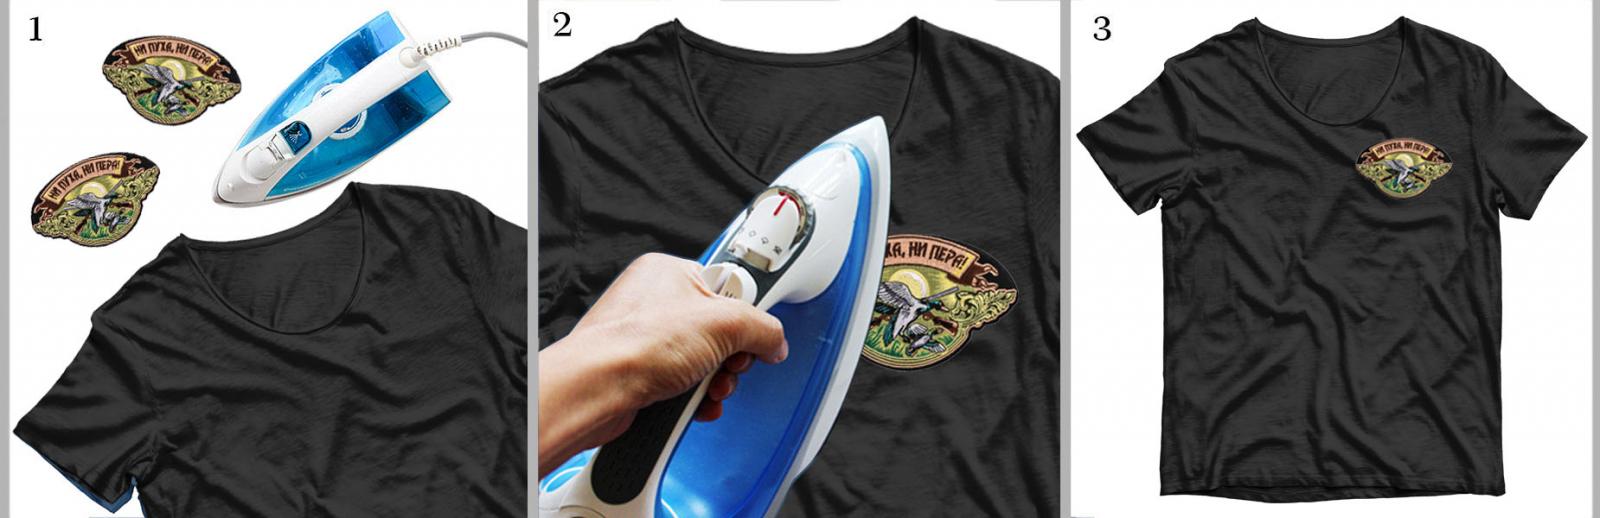 "Охотничья нашивка ""Ни пуха, ни пера!"" на футболке"